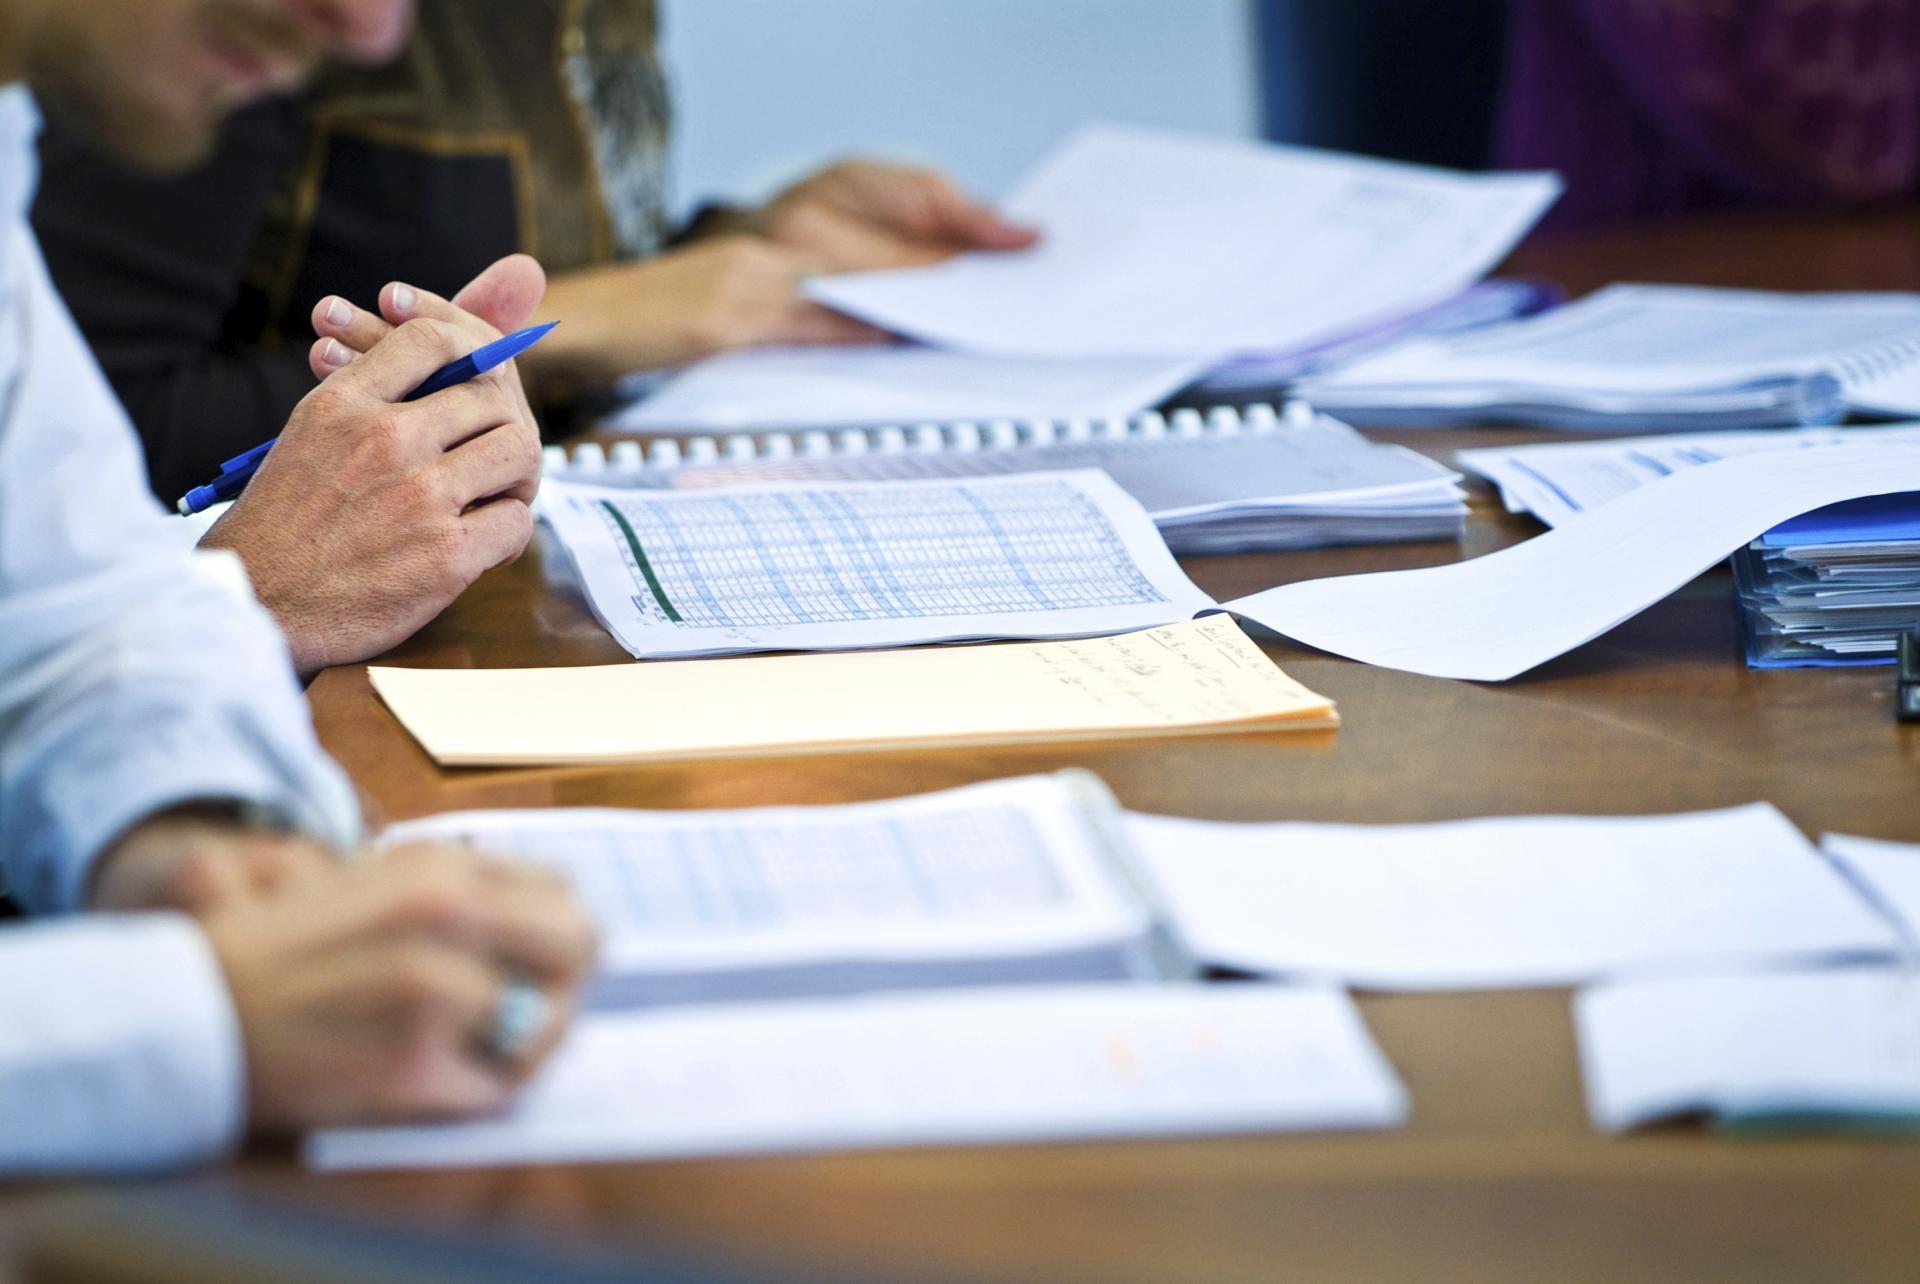 В структуре МЧС РК созданы четыре комитета